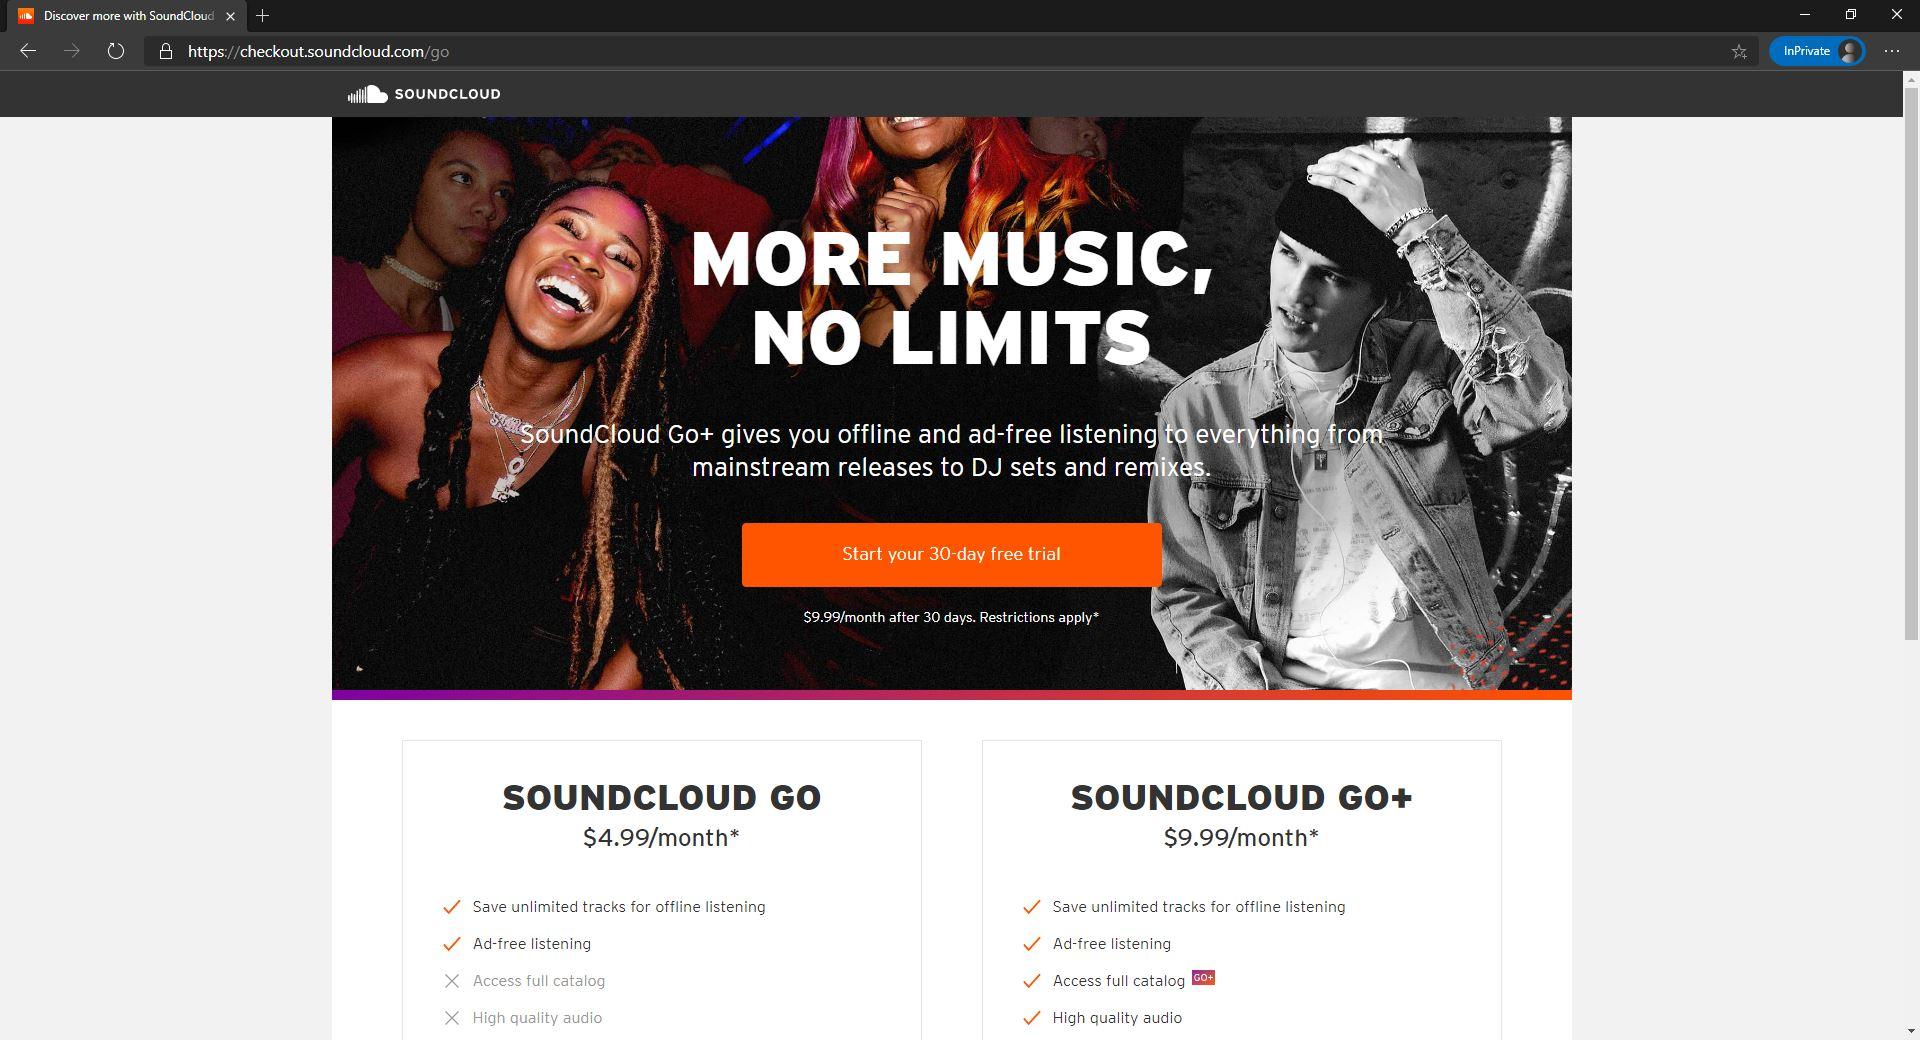 SoundCloud website homepage